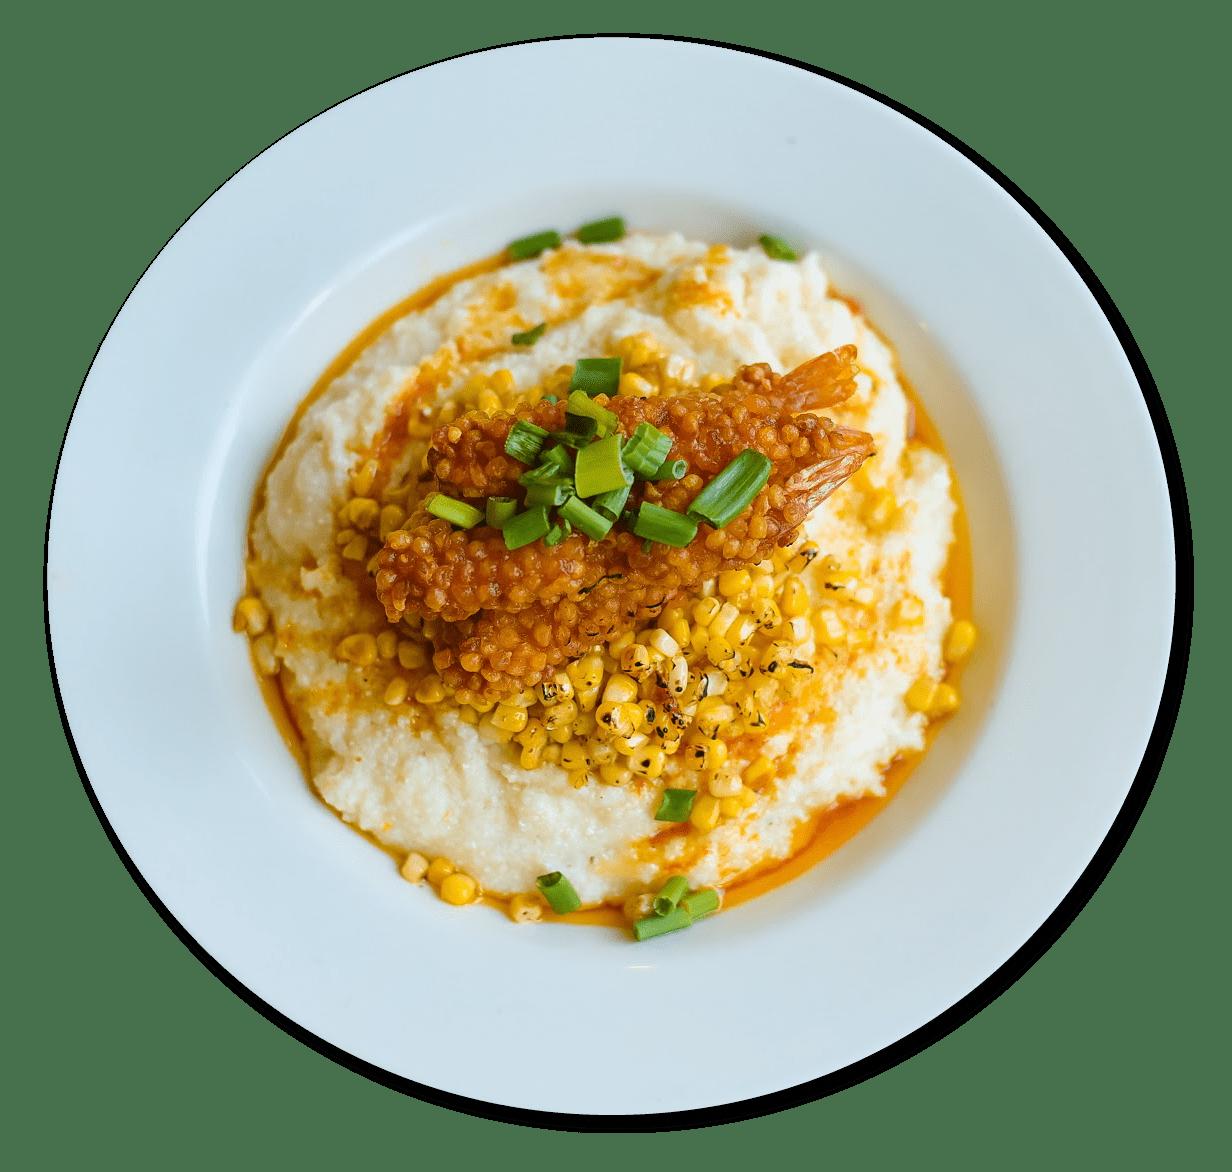 Fried Shrimp and Grits Image